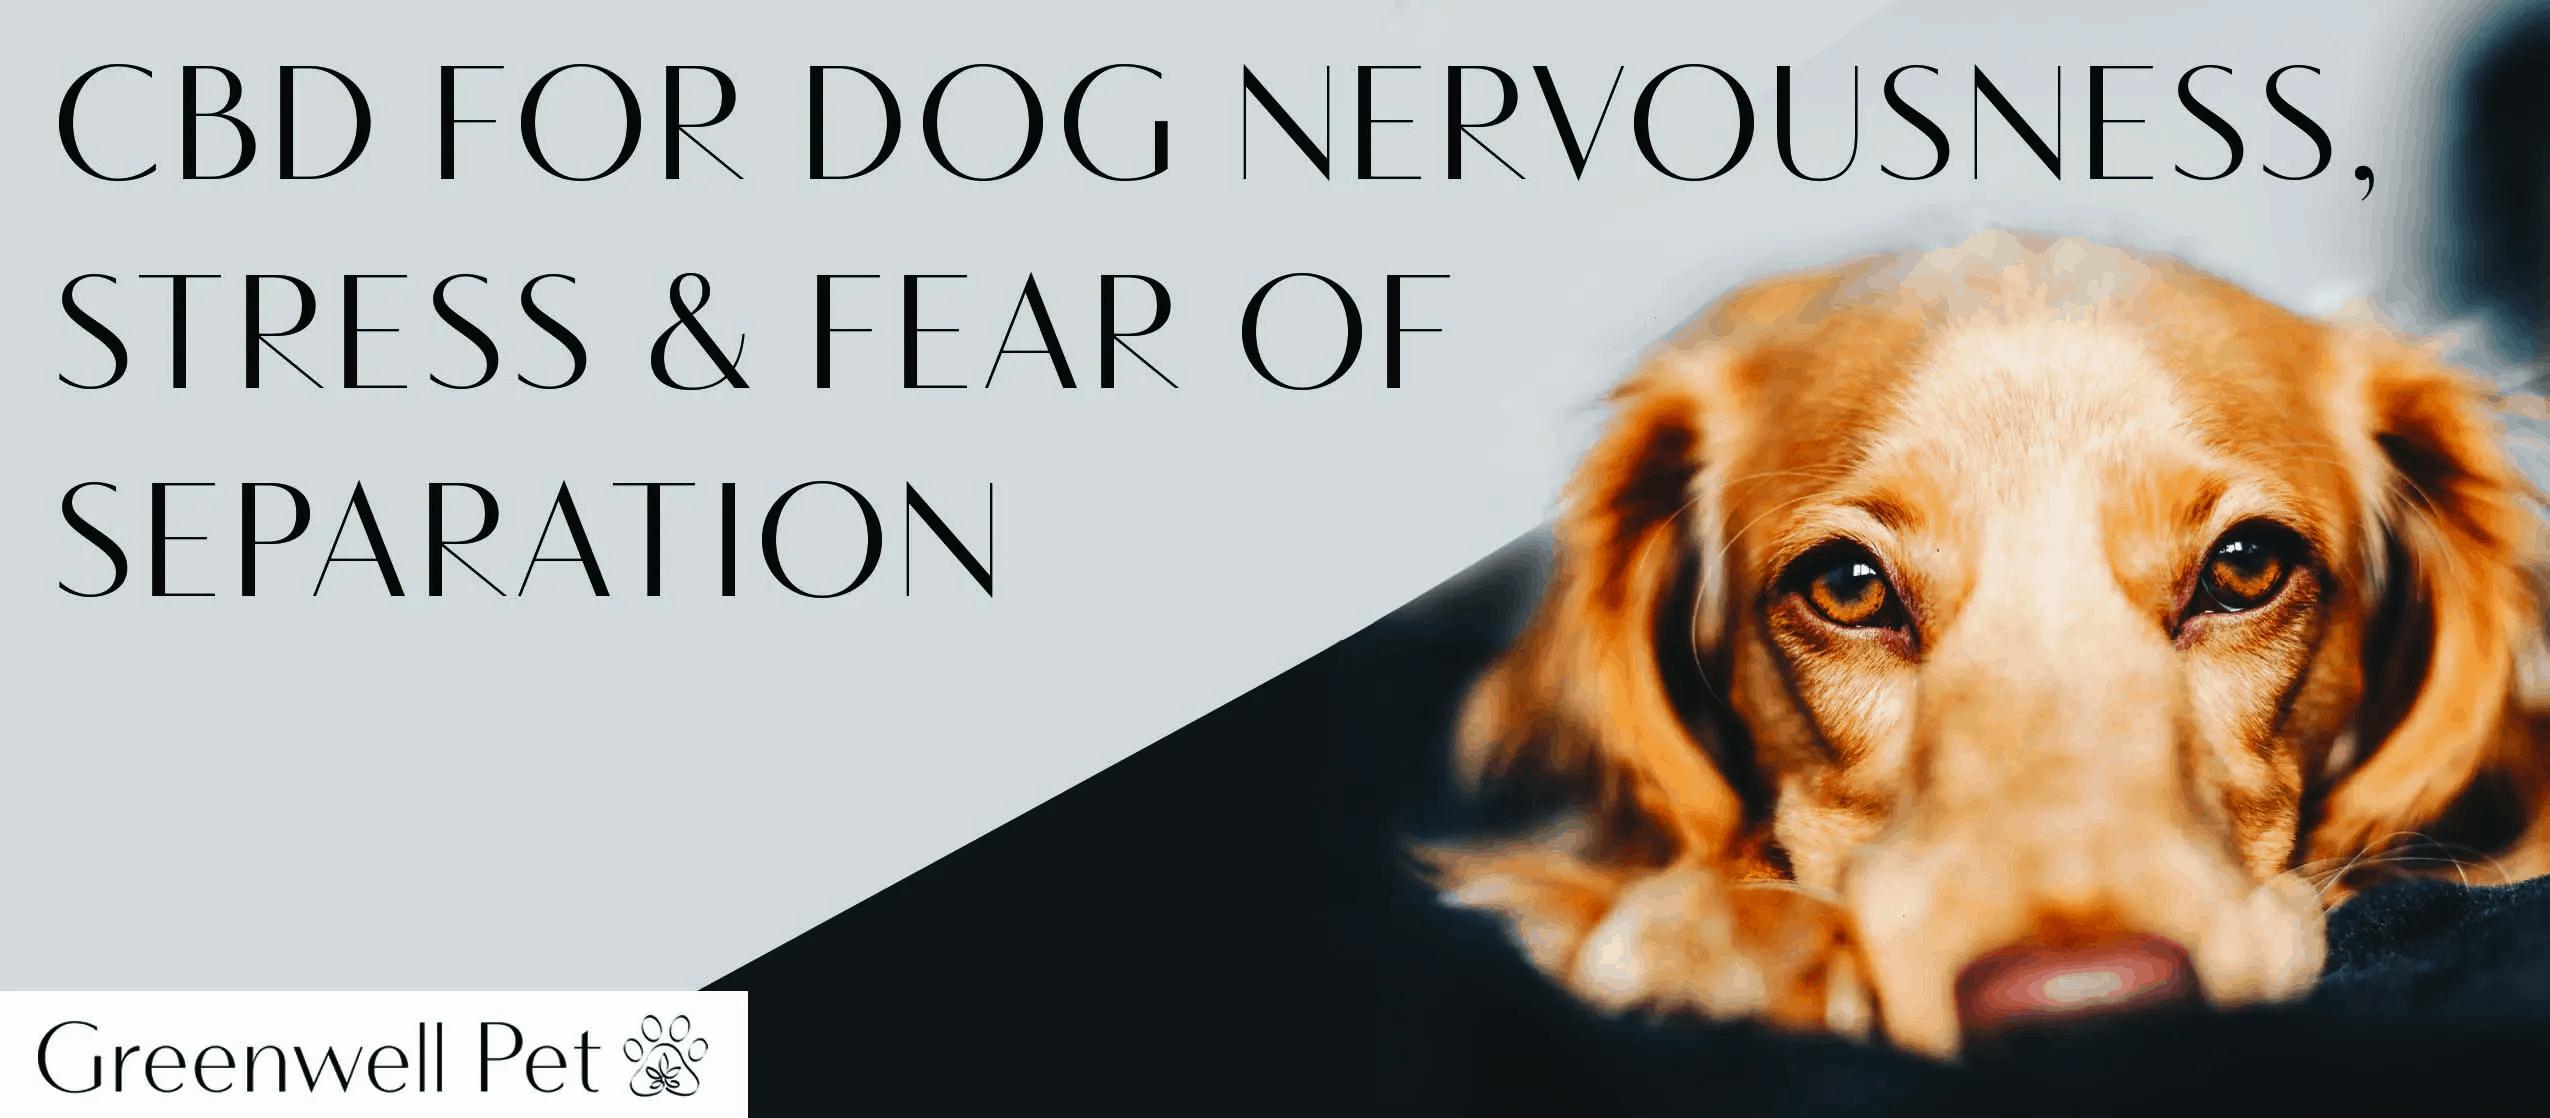 Greenwell Pet CBD Coupon Code Dog's Nervousness